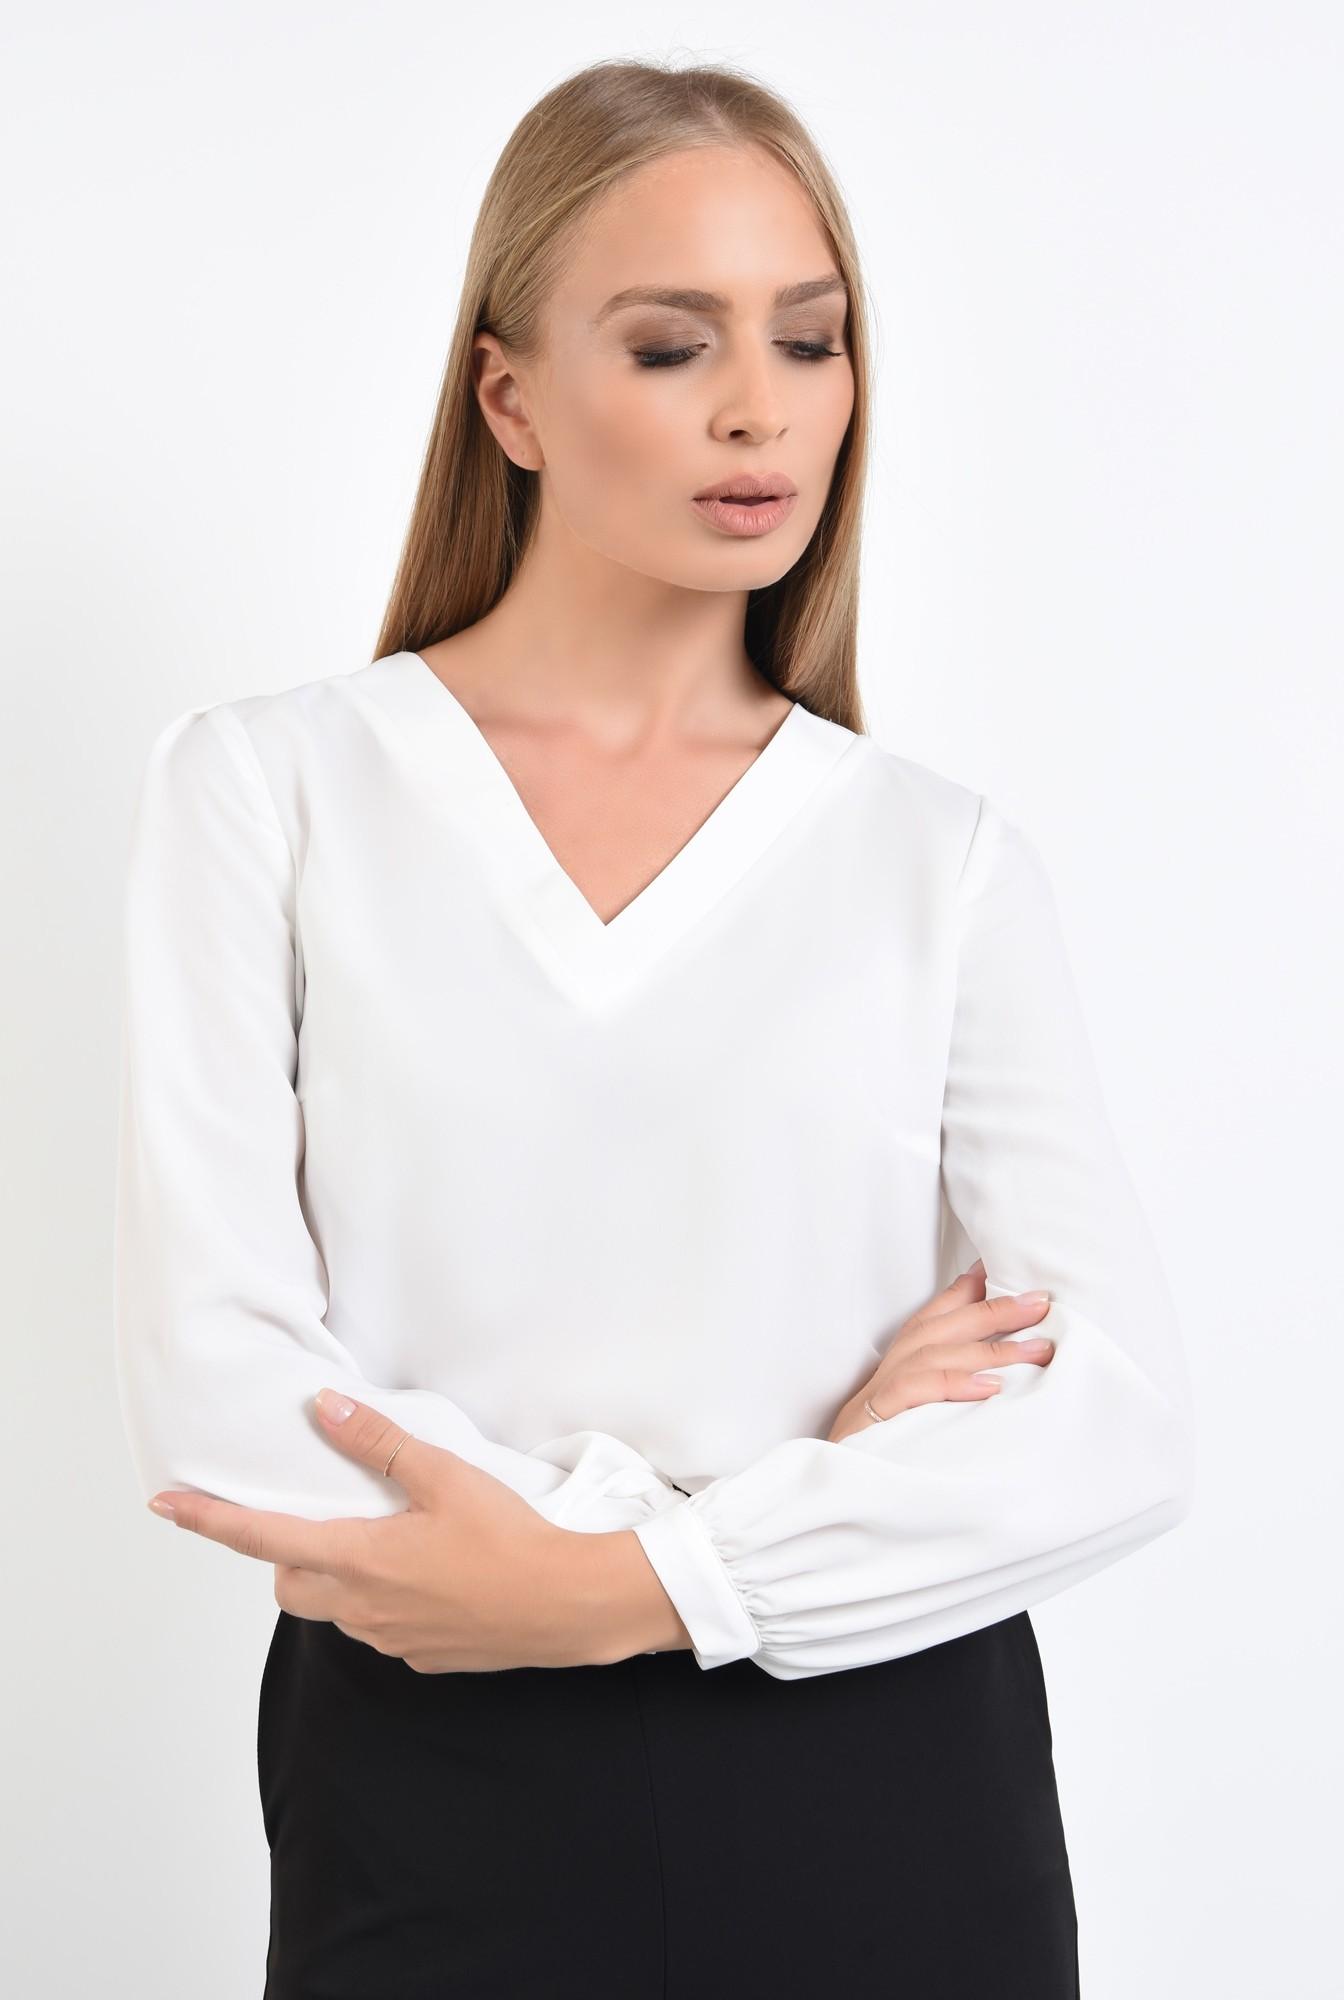 2 - bluze online, alb, decolteu in V, maneci bufante, mansete